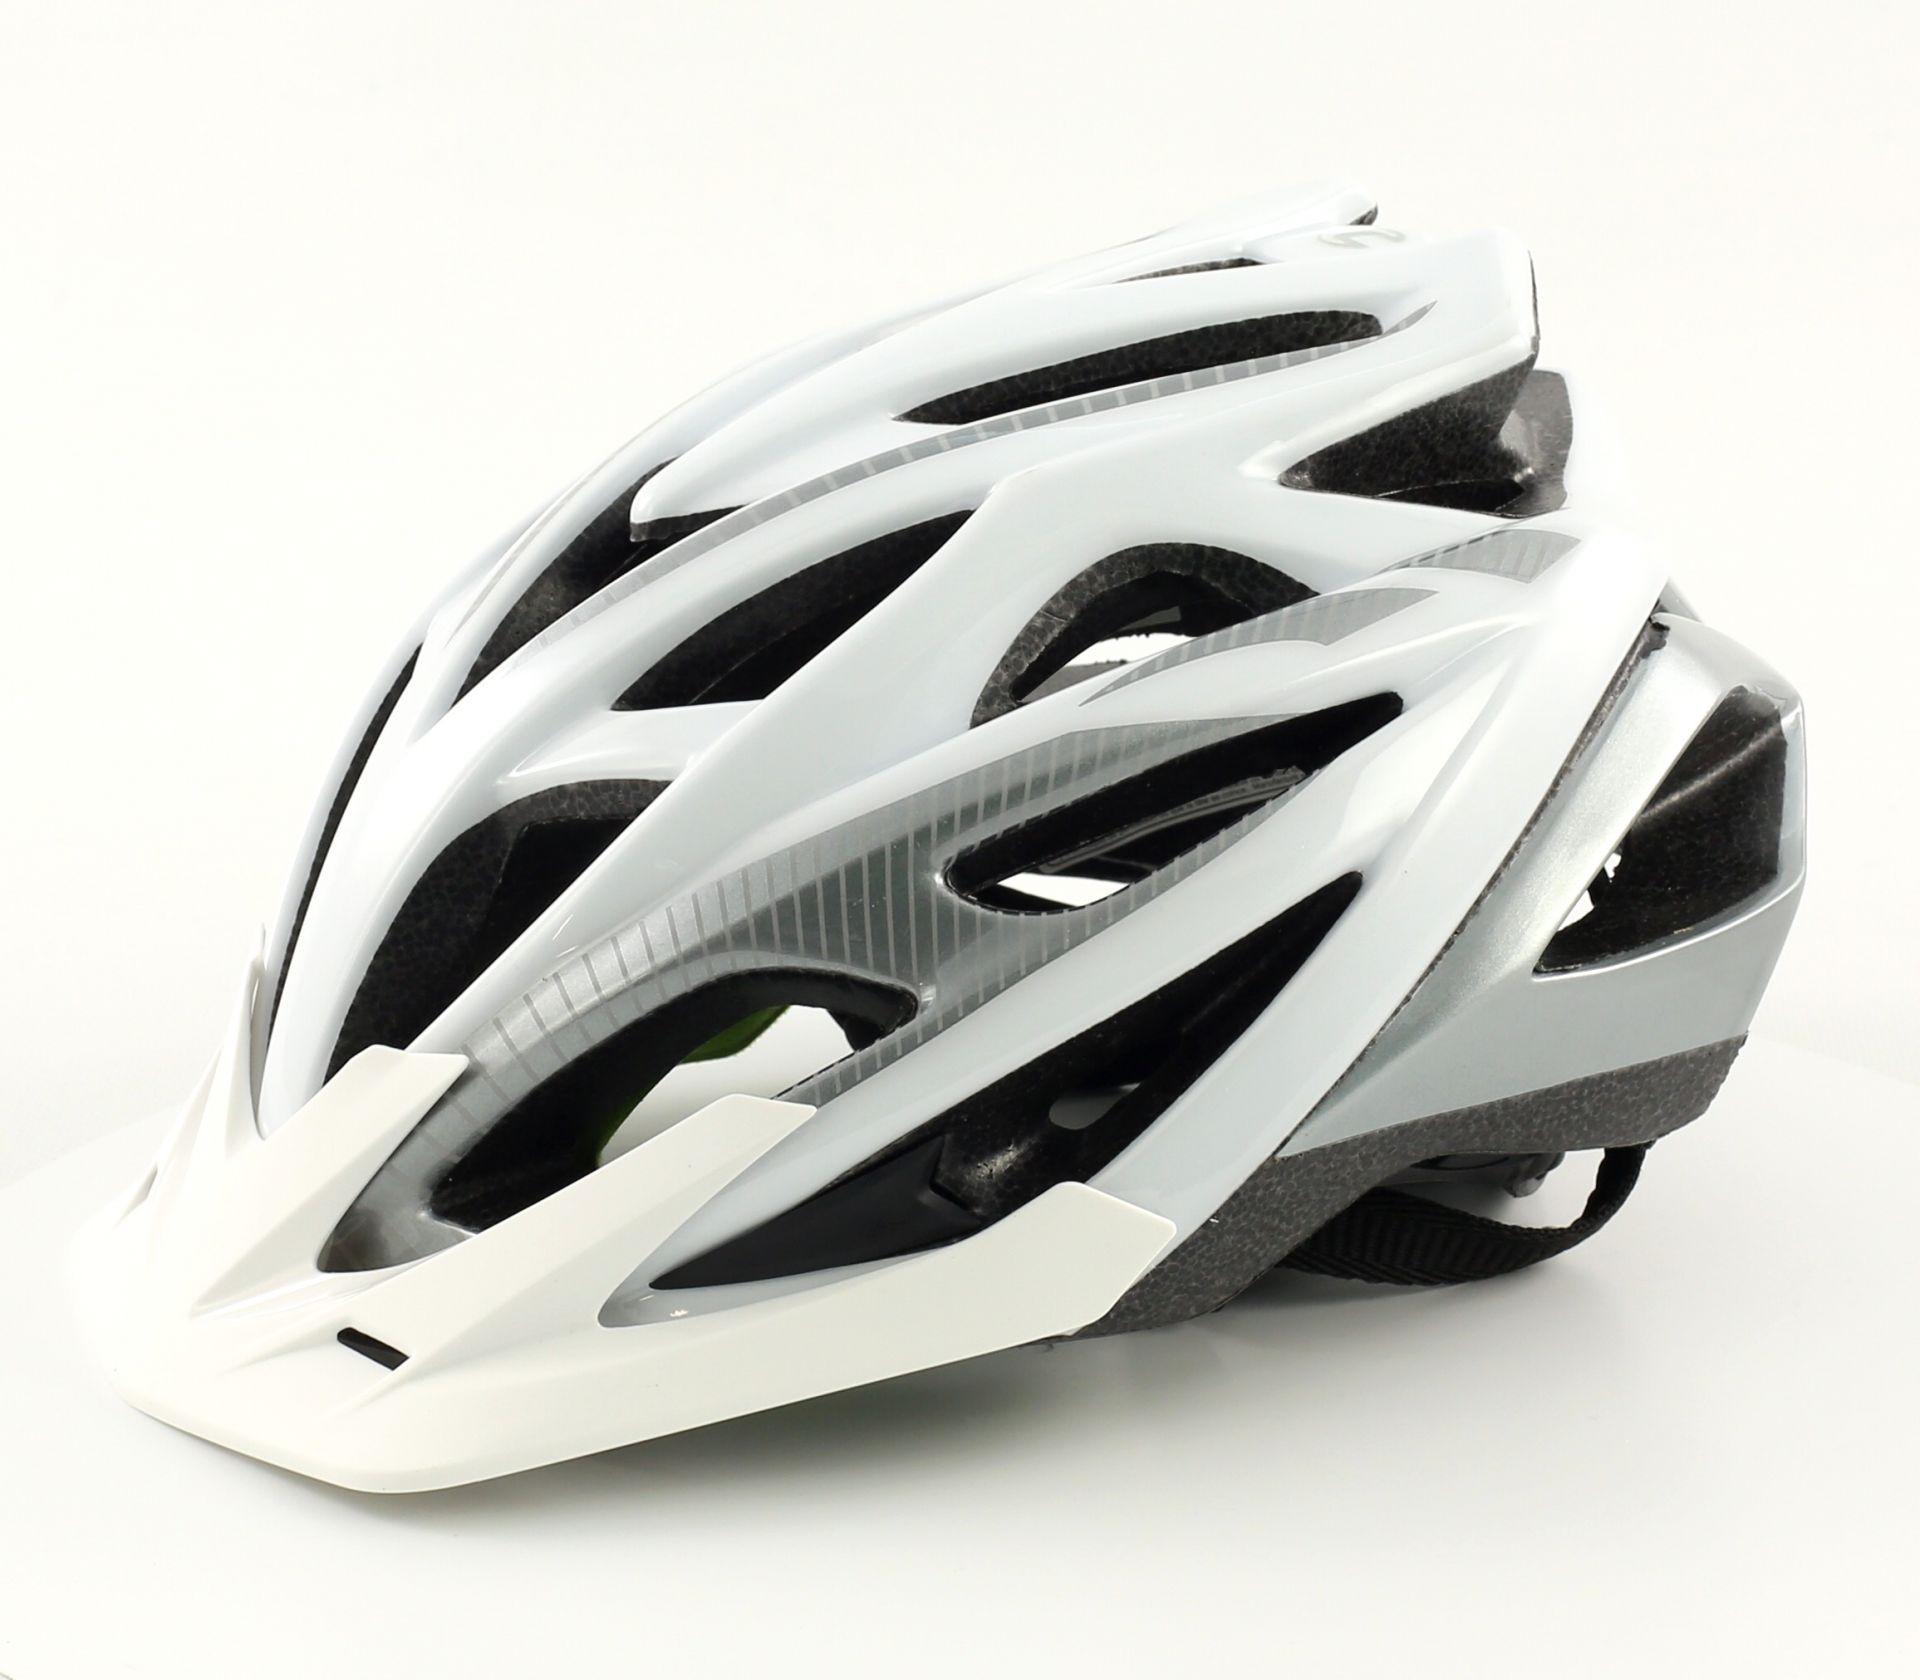 Casque Cannondale Helmet Radius (White/Silver) L